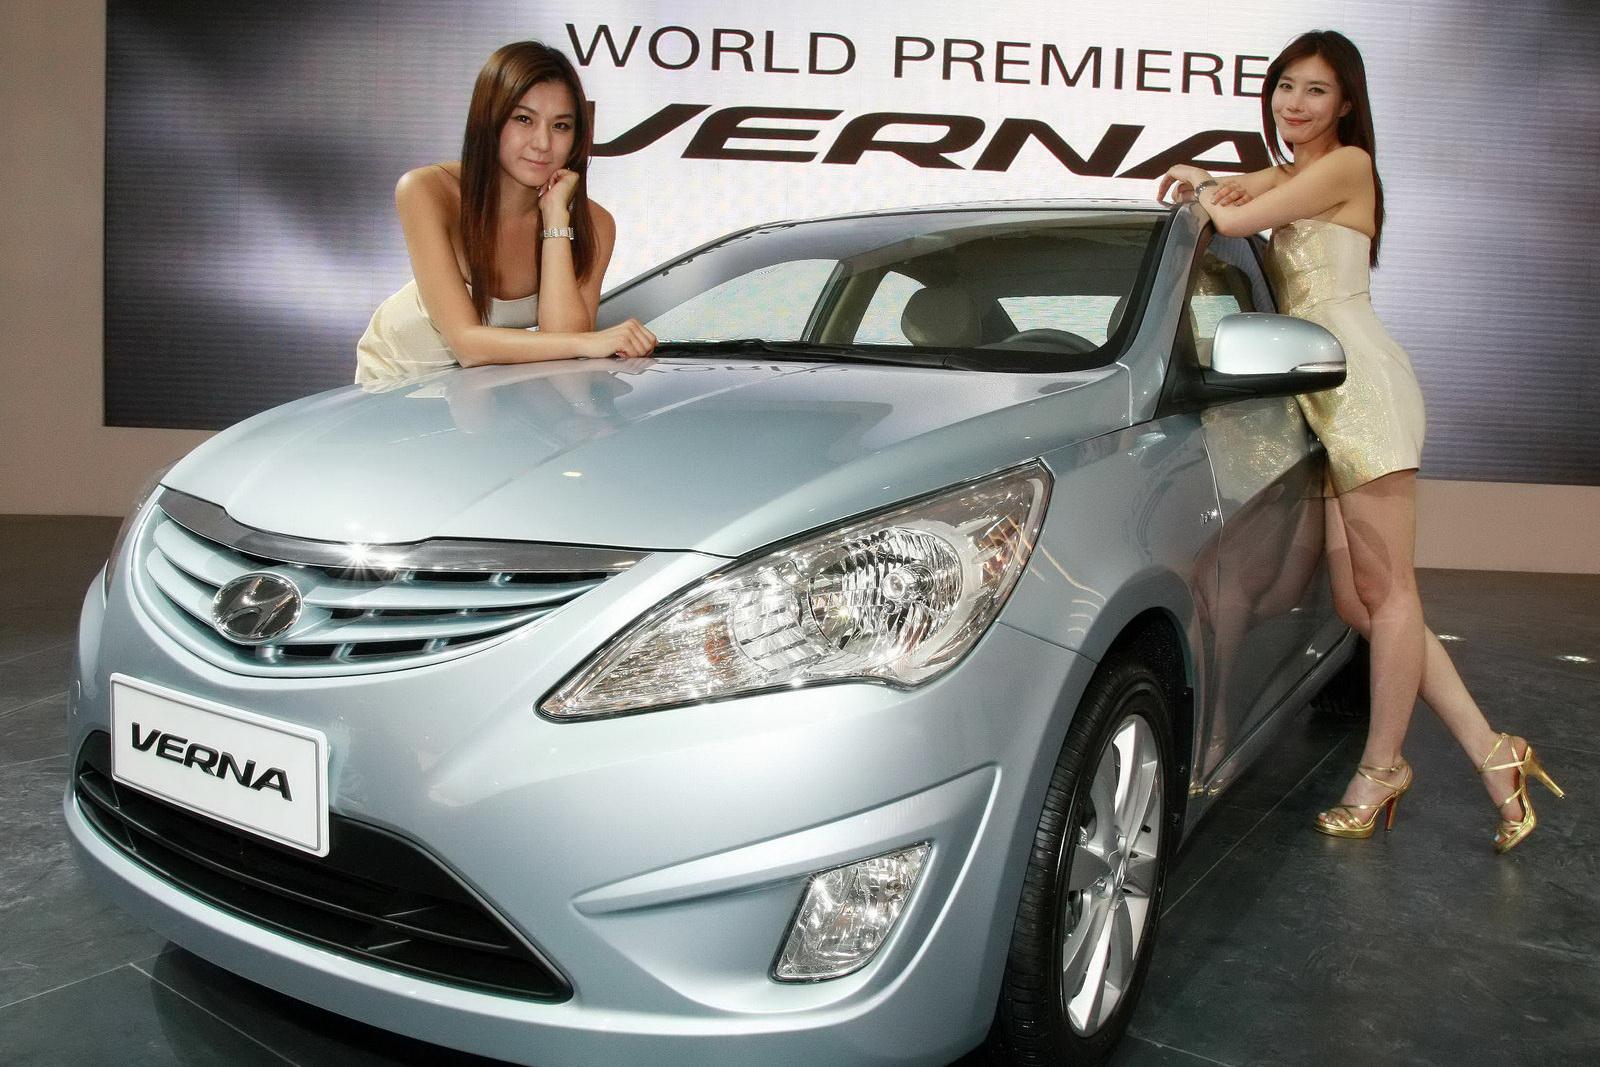 http://3.bp.blogspot.com/_eKbvSsz0vNc/S-8CSq4nTGI/AAAAAAAAAhE/SF2-H9rEe2M/s1600/2011-Hyundai-Accent-%2Bphilippines.jpg